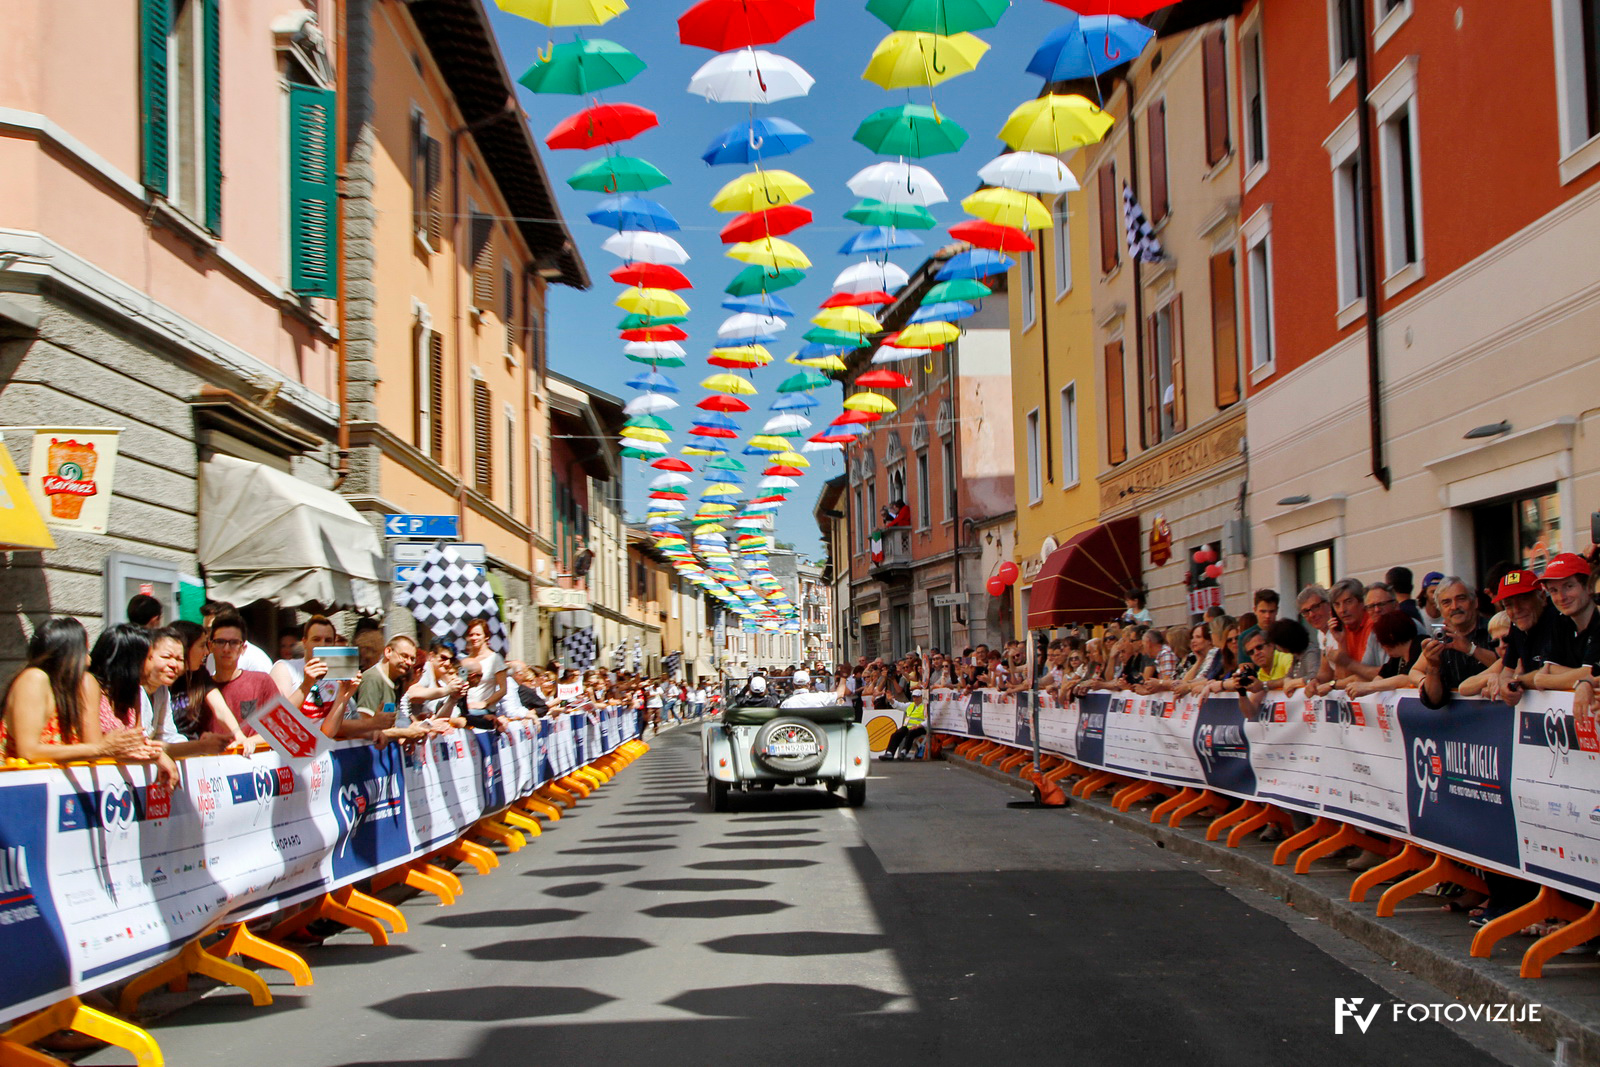 Odlično vzdušje na poti proti cilju dirke Mille Miglia 2017